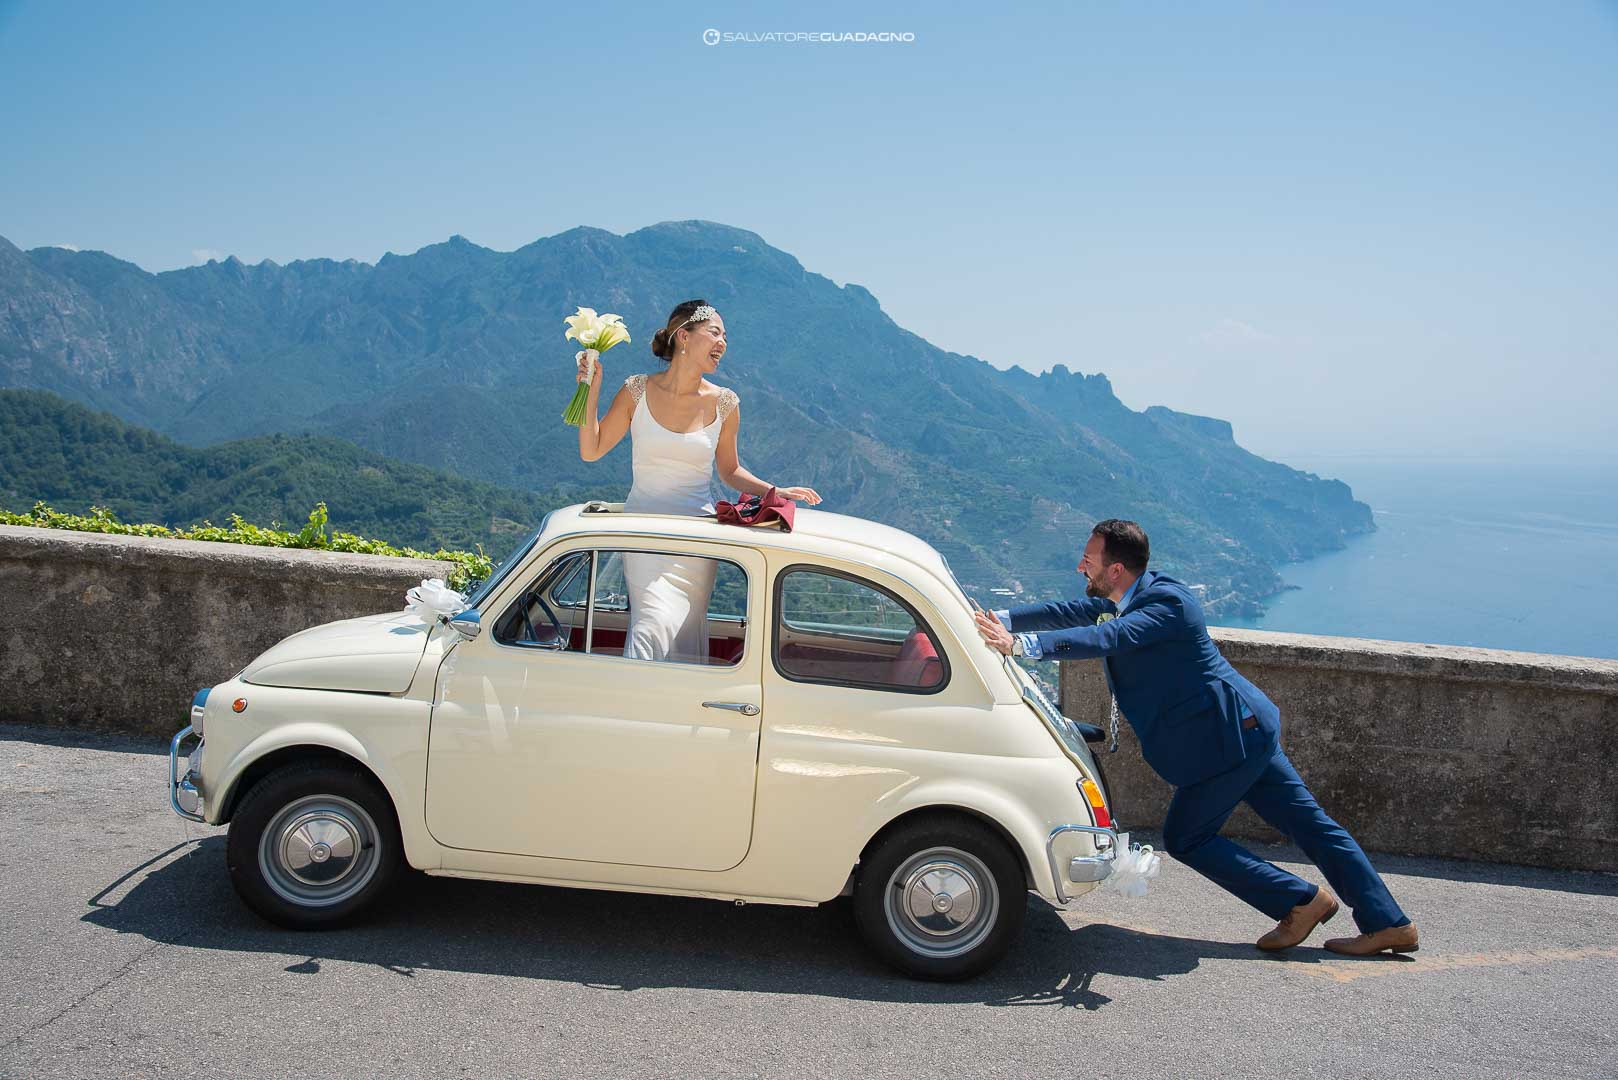 matrimonio-costiera-amalfitana-auto-epoca-ravello-fotografo